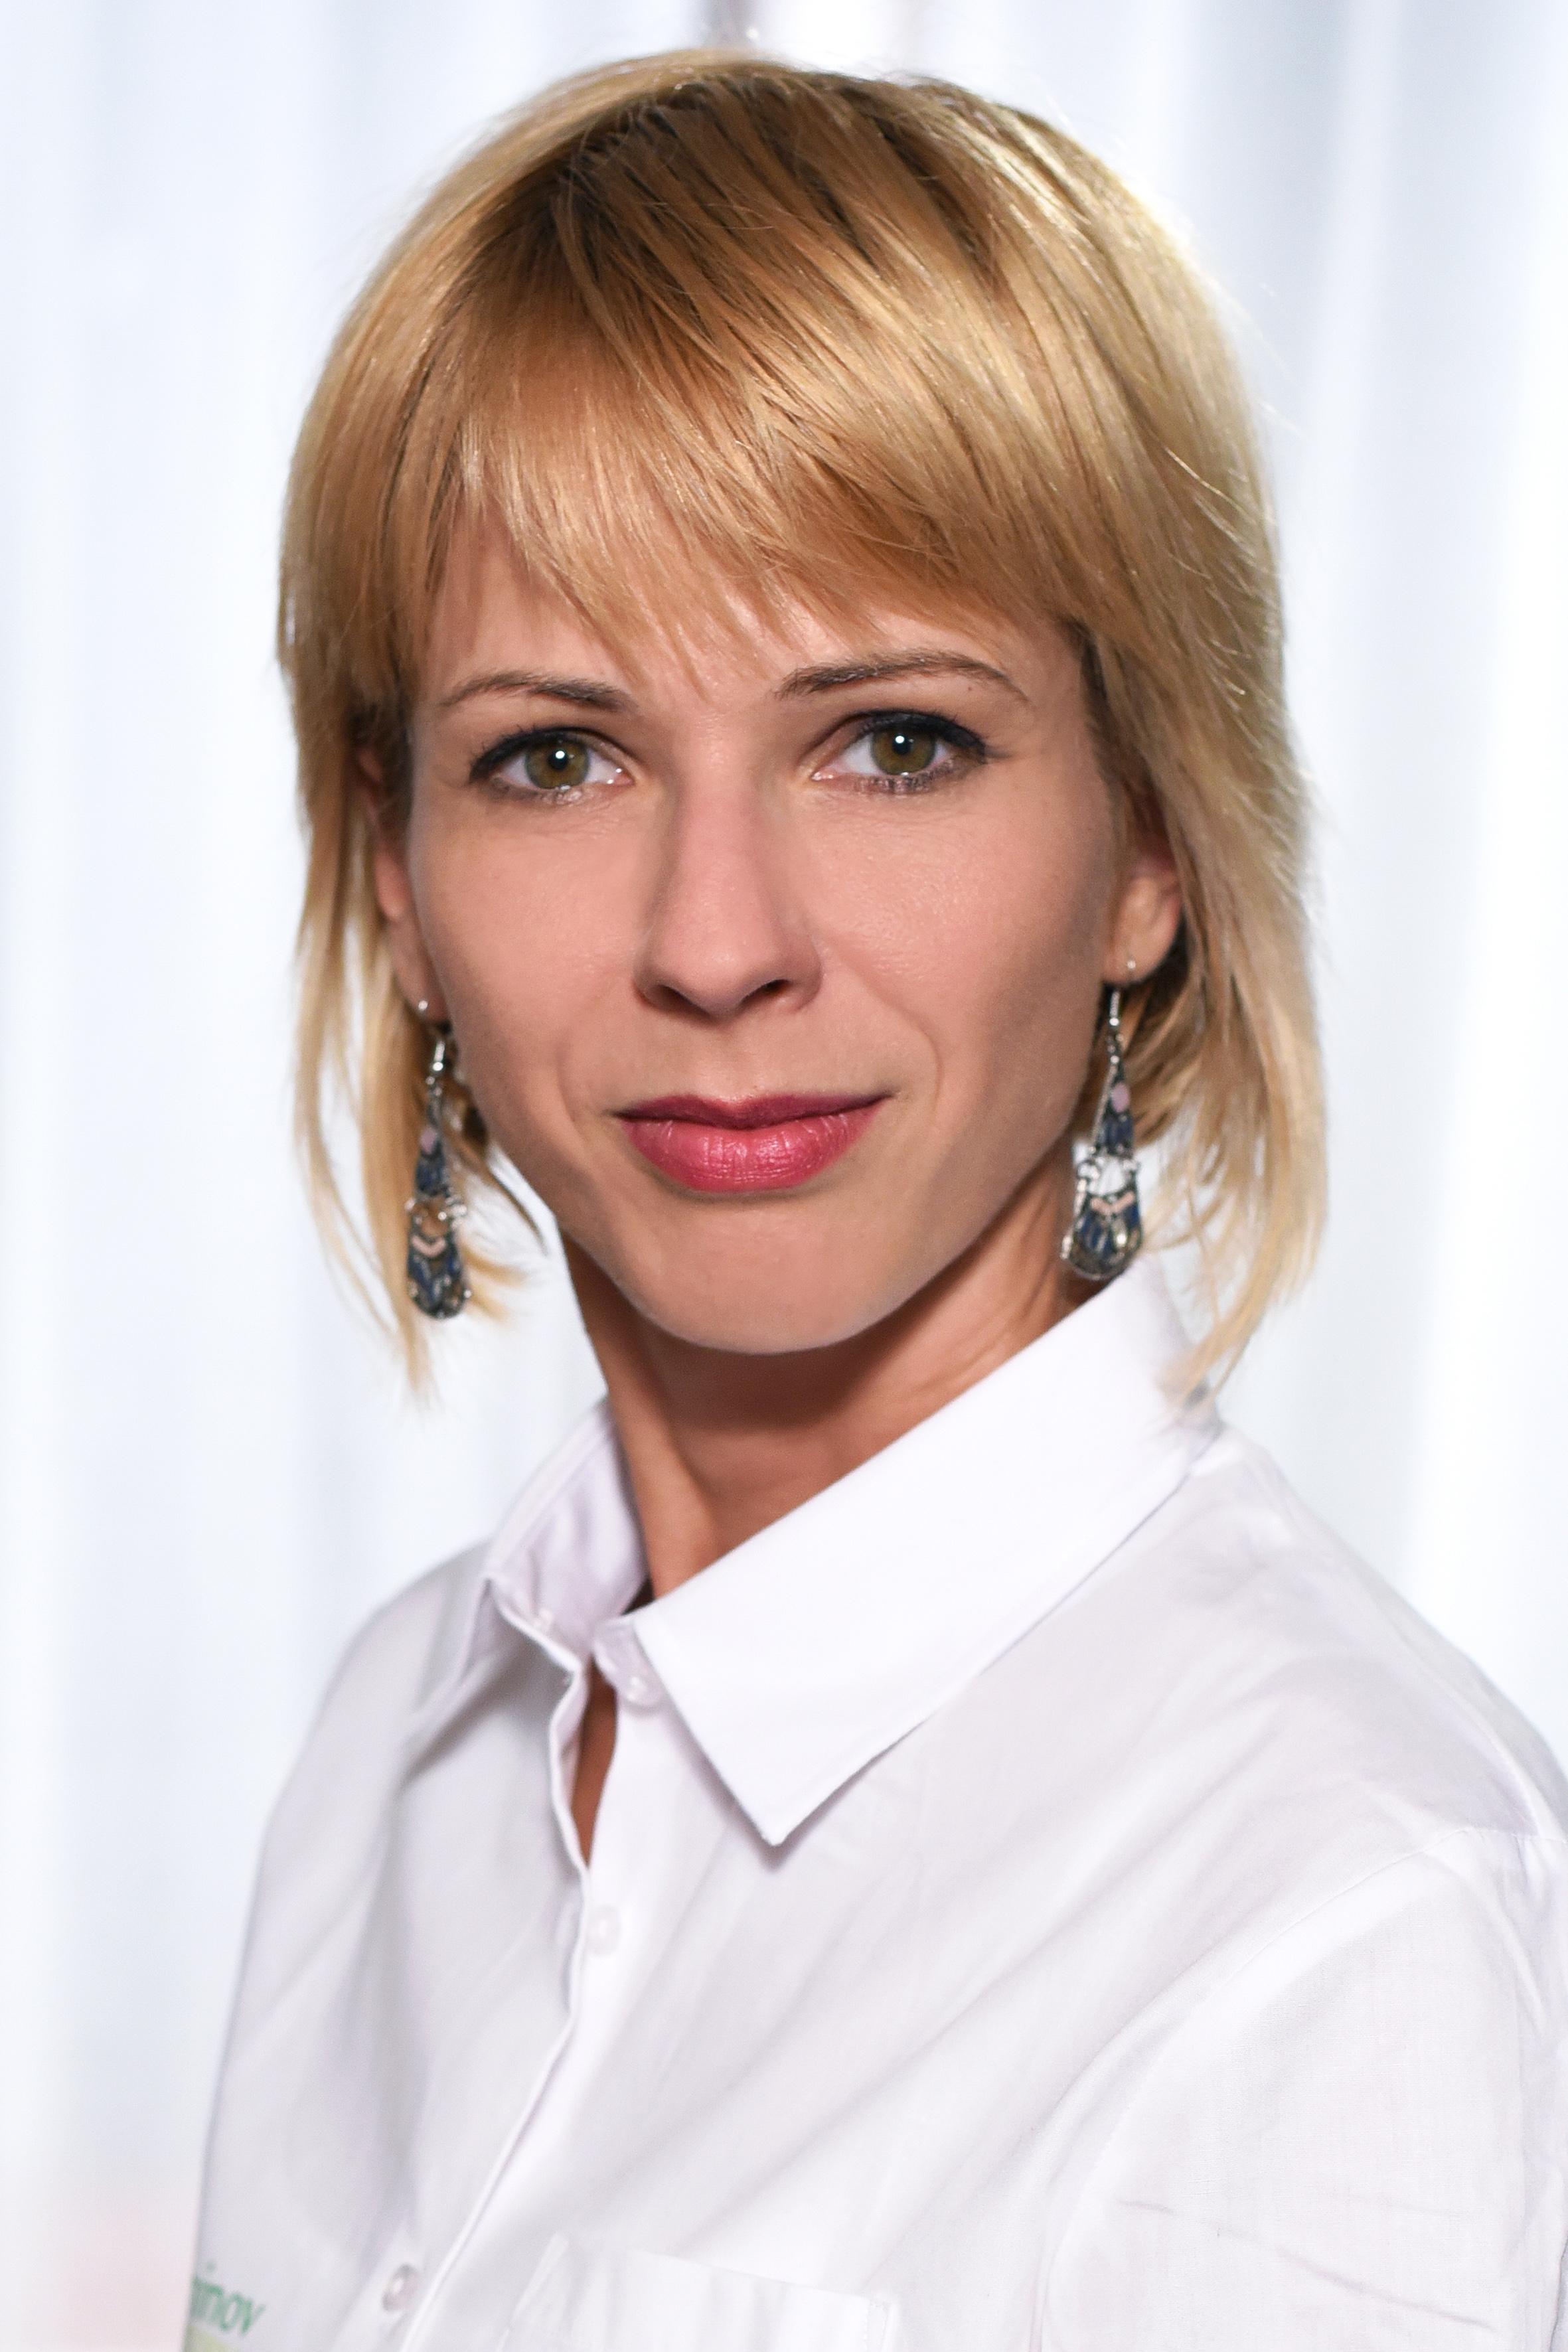 /assets/media/dr-orosz-zsuzsanna.jpg